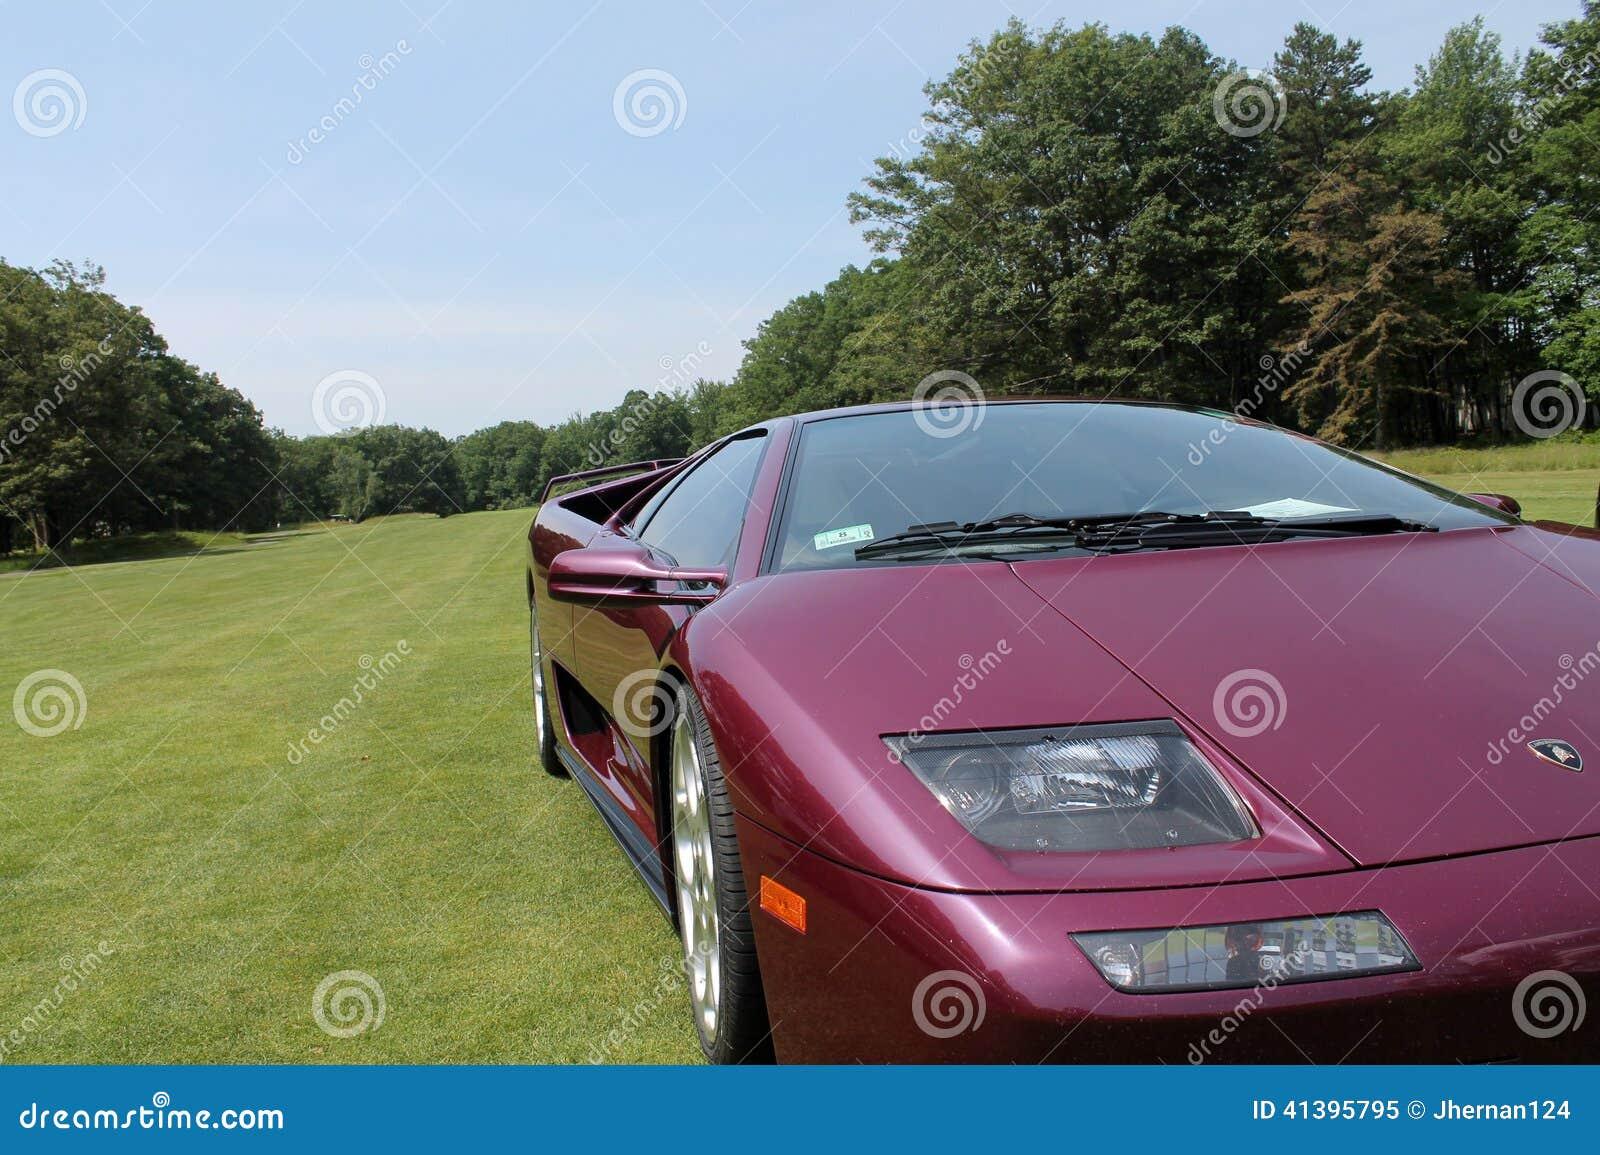 Purple Lamborghini On Lawn Corner View Editorial Image Image Of